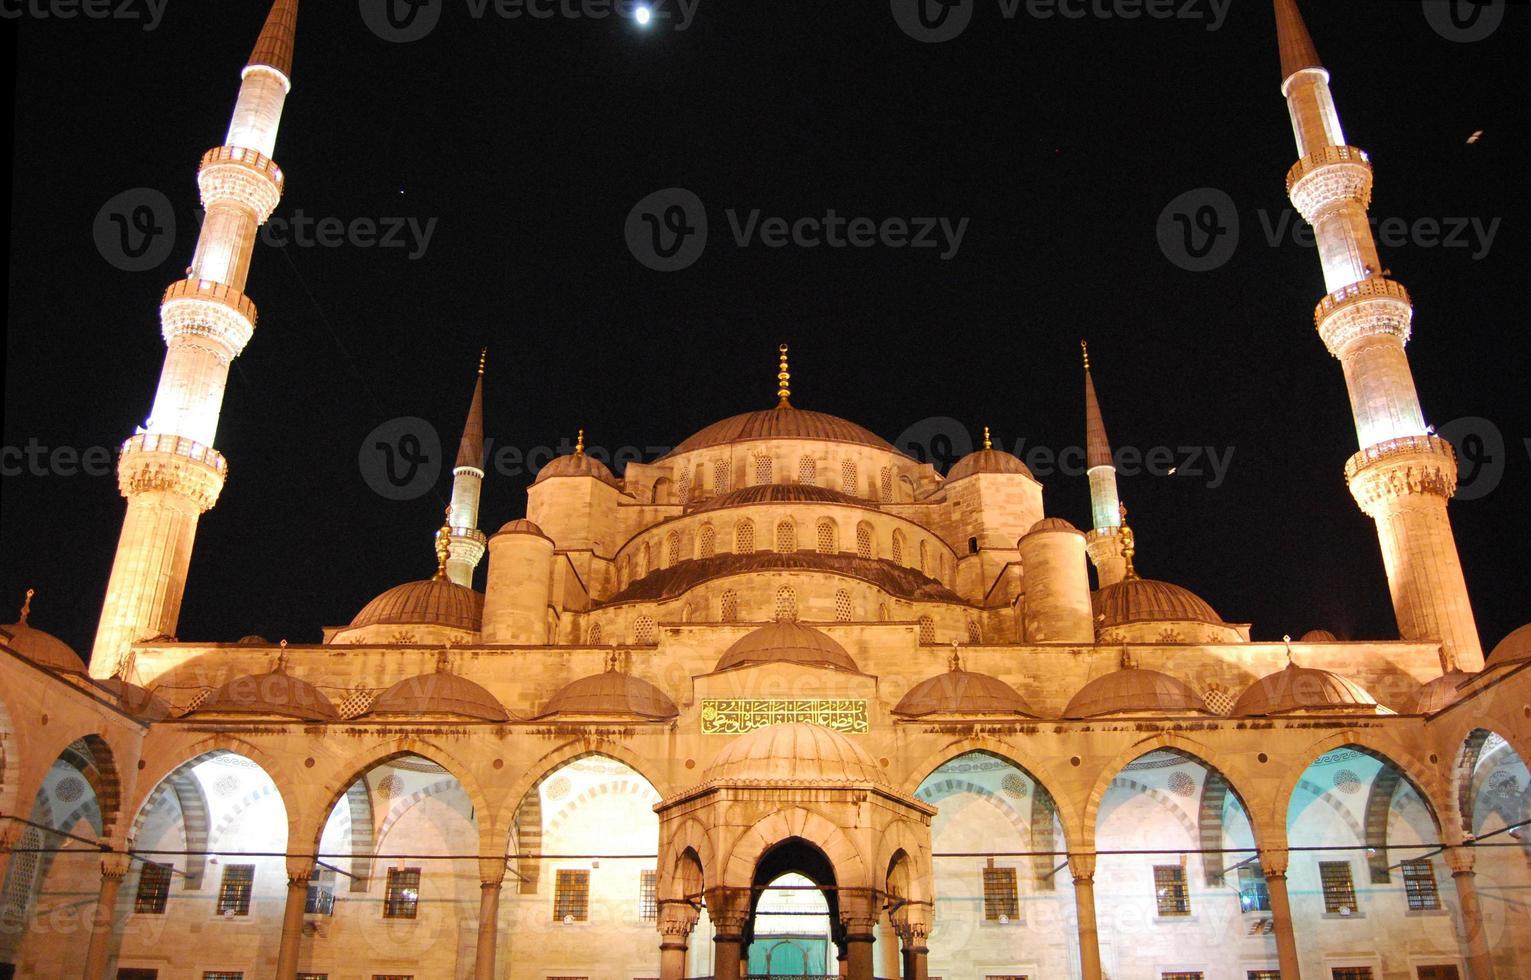 mosquée bleue, sultanahmet istanbul .. photo